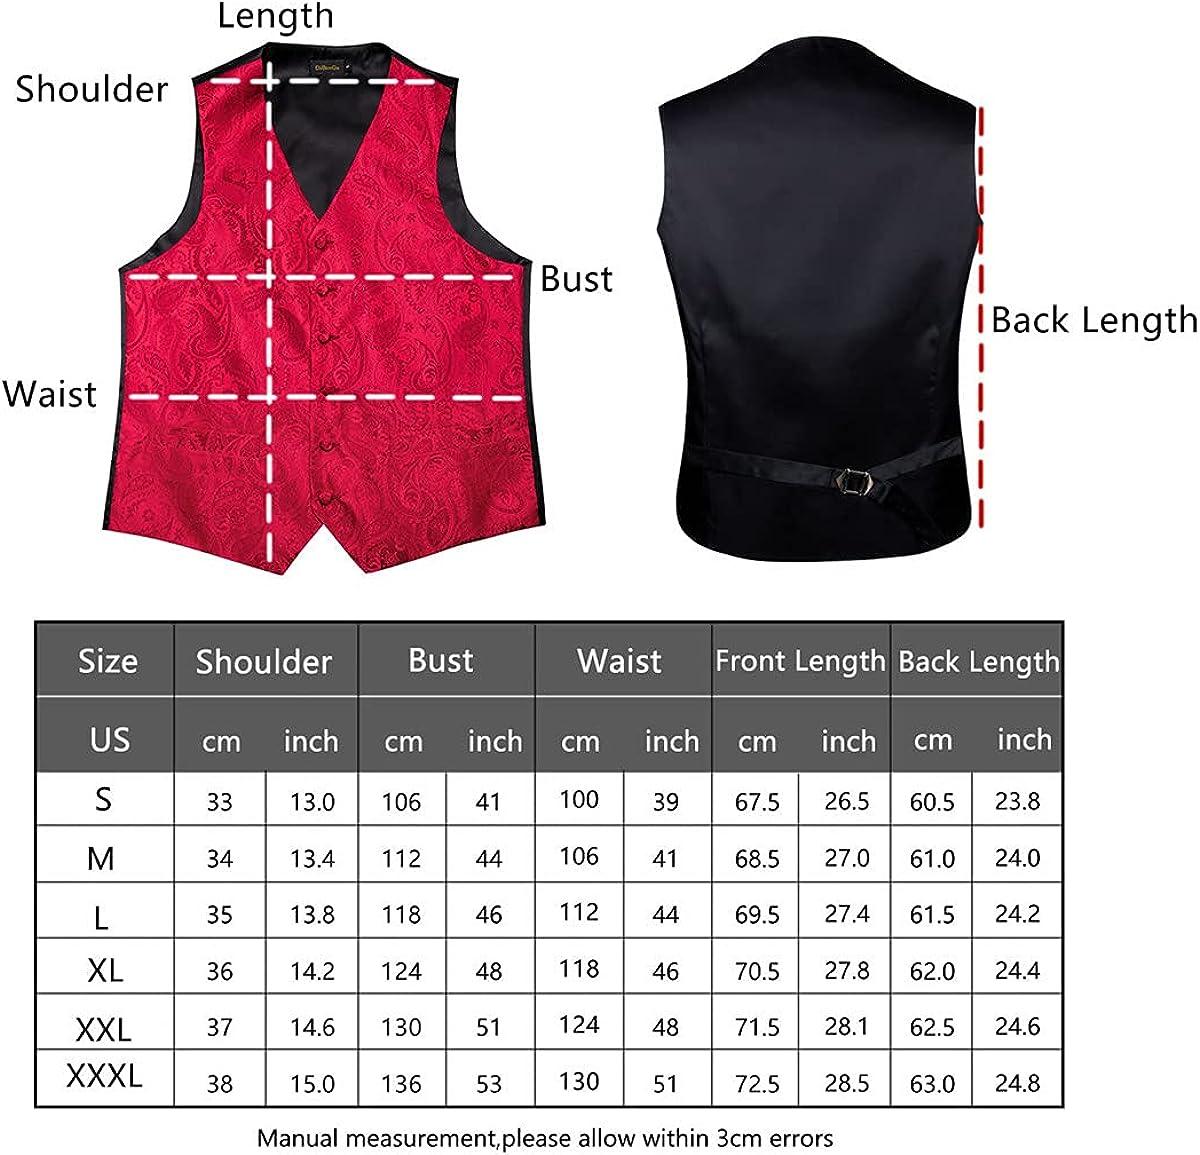 Fashion silk suit vest formal vest fitness sleeveless jacket wedding vest bow tie tie pocket